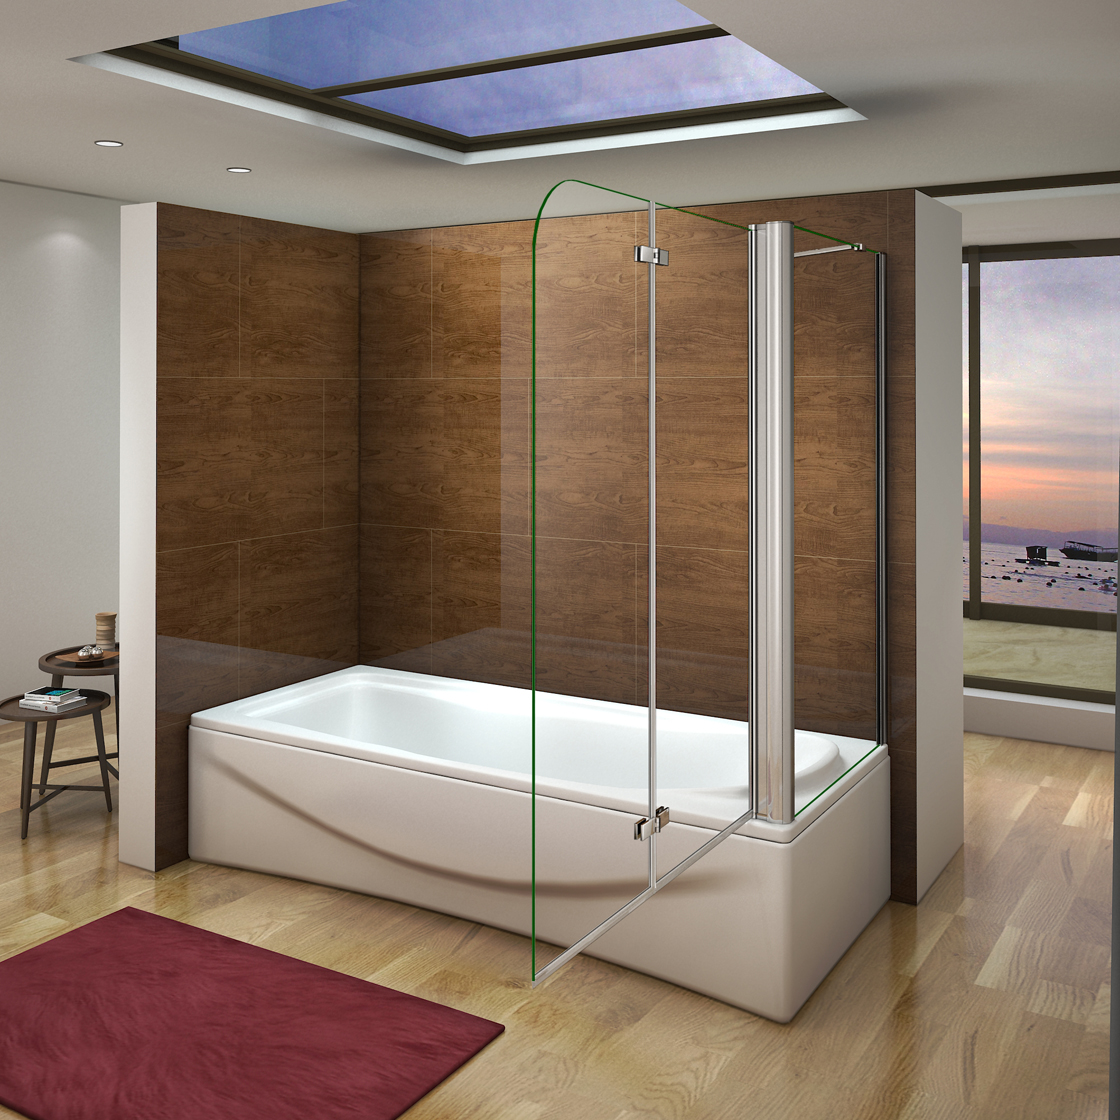 faltwand badewannenaufsatz duschwand nano glas. Black Bedroom Furniture Sets. Home Design Ideas